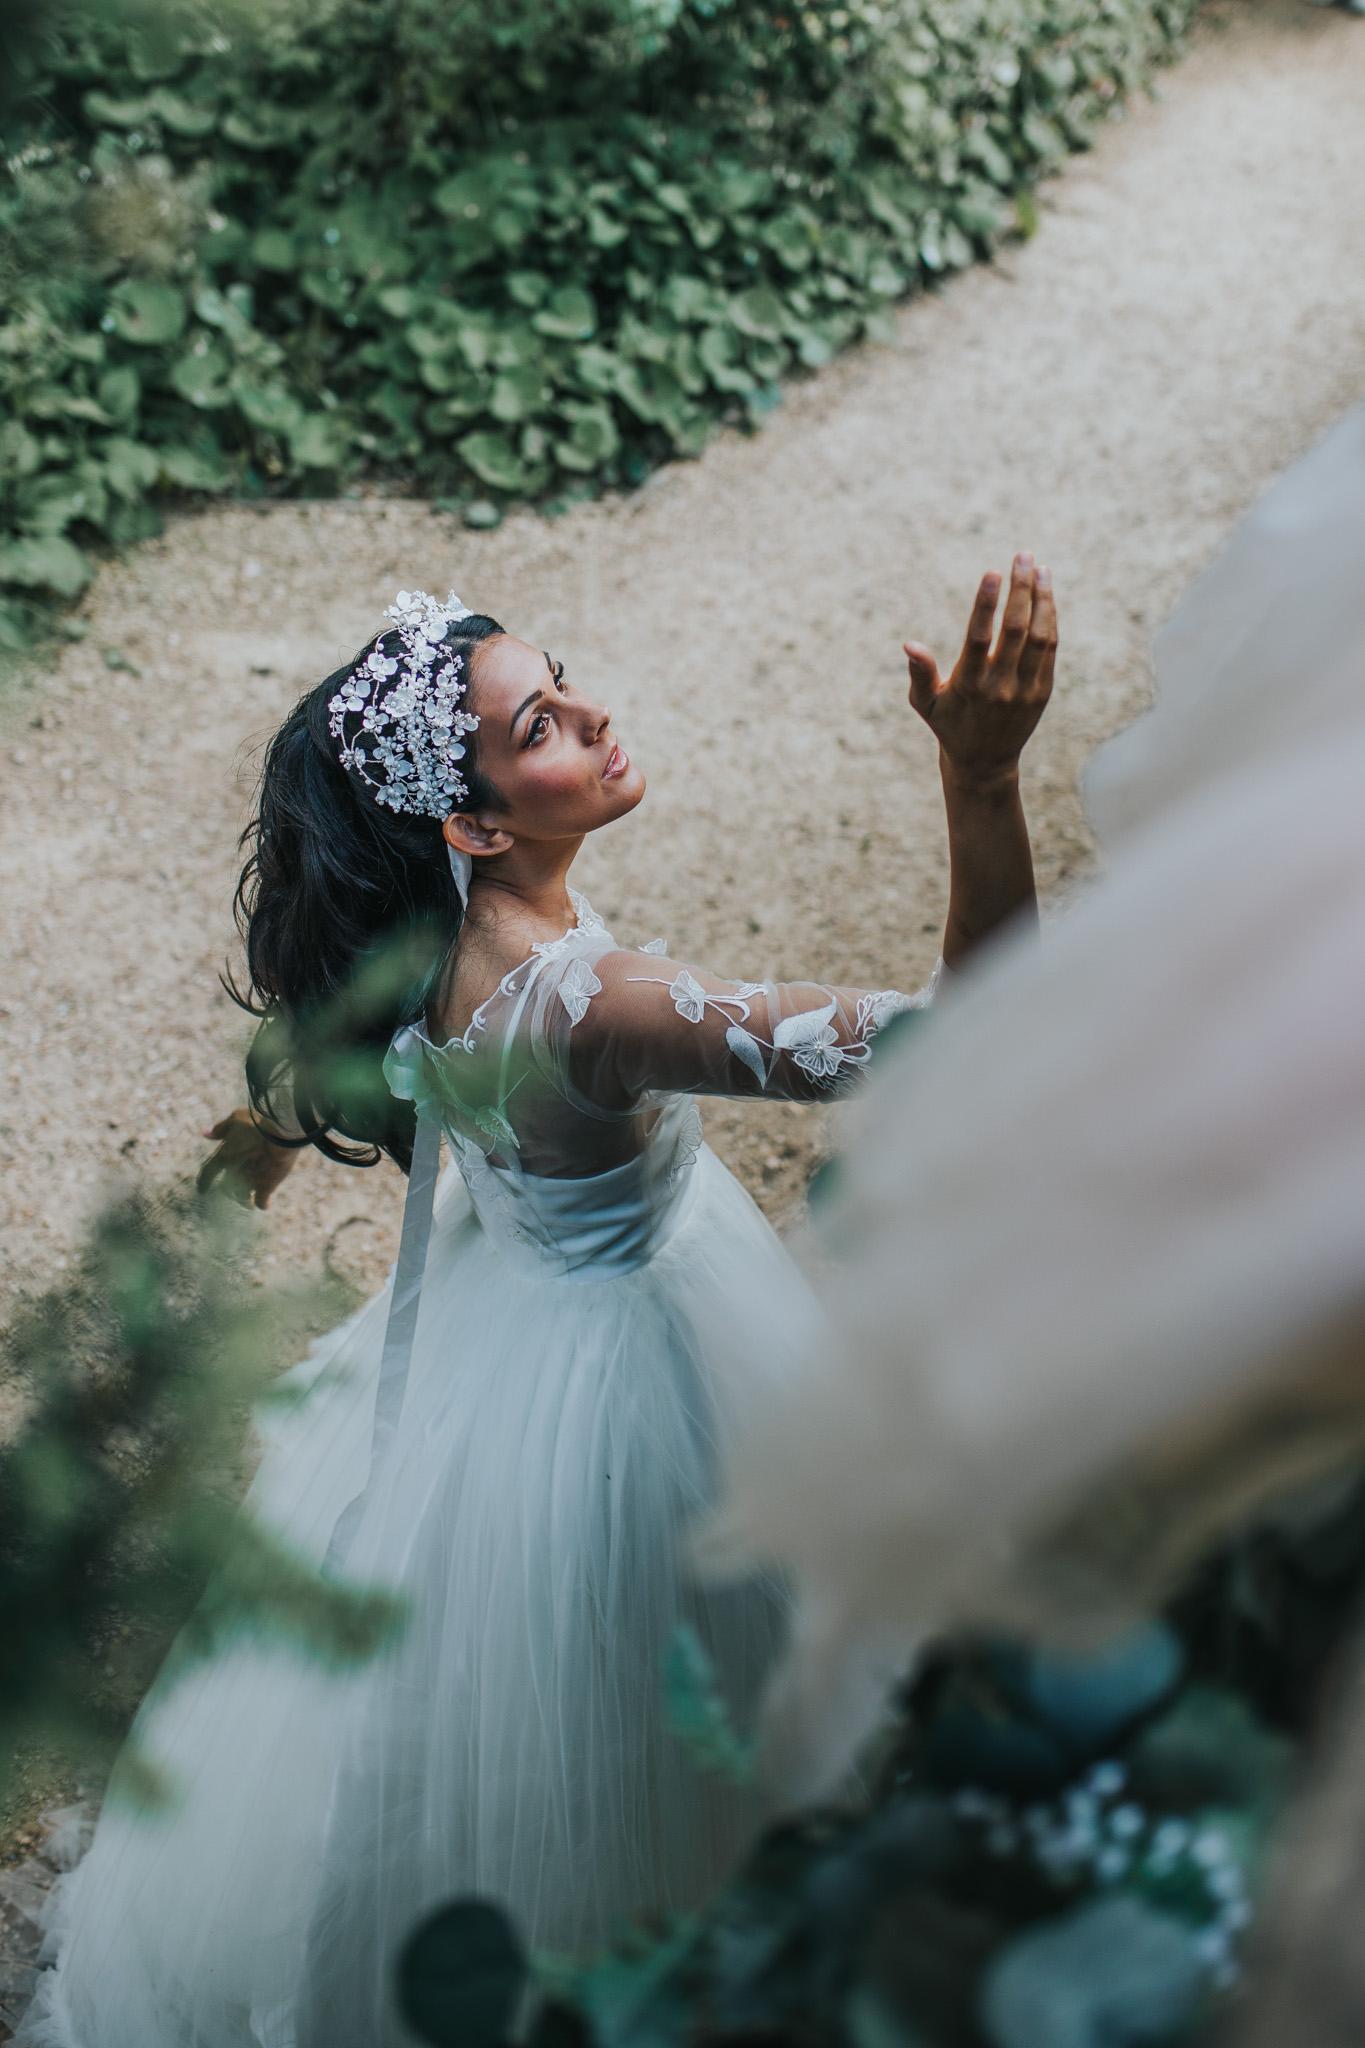 fairytale wedding dress - unique wedding dress - unique bridal wear - unique bridal headdress - artistic bridal photography